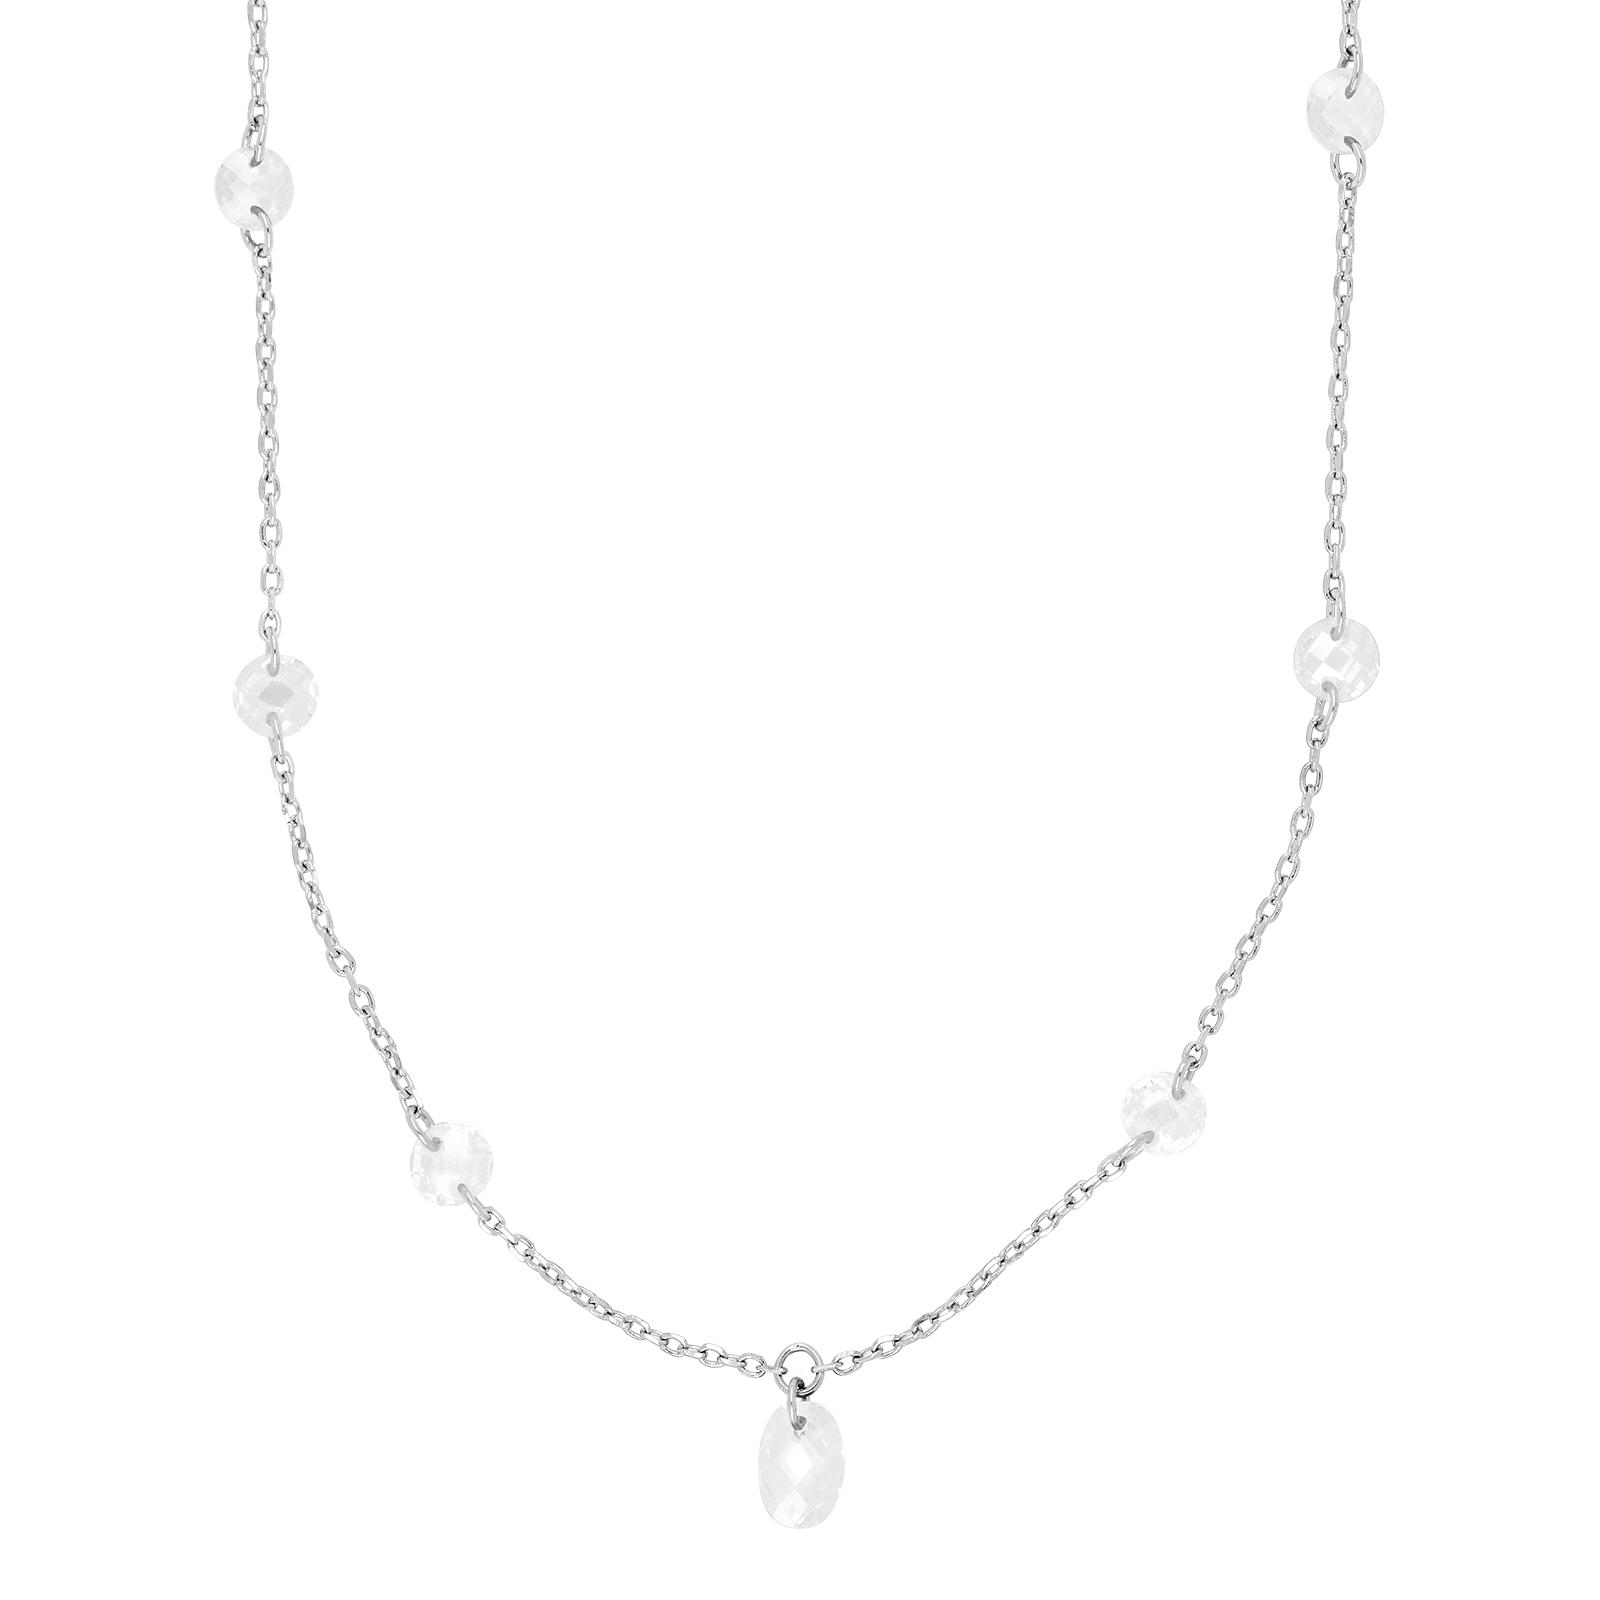 Rhodineret sølv halskæde med hvide sten fra Joanli Nor